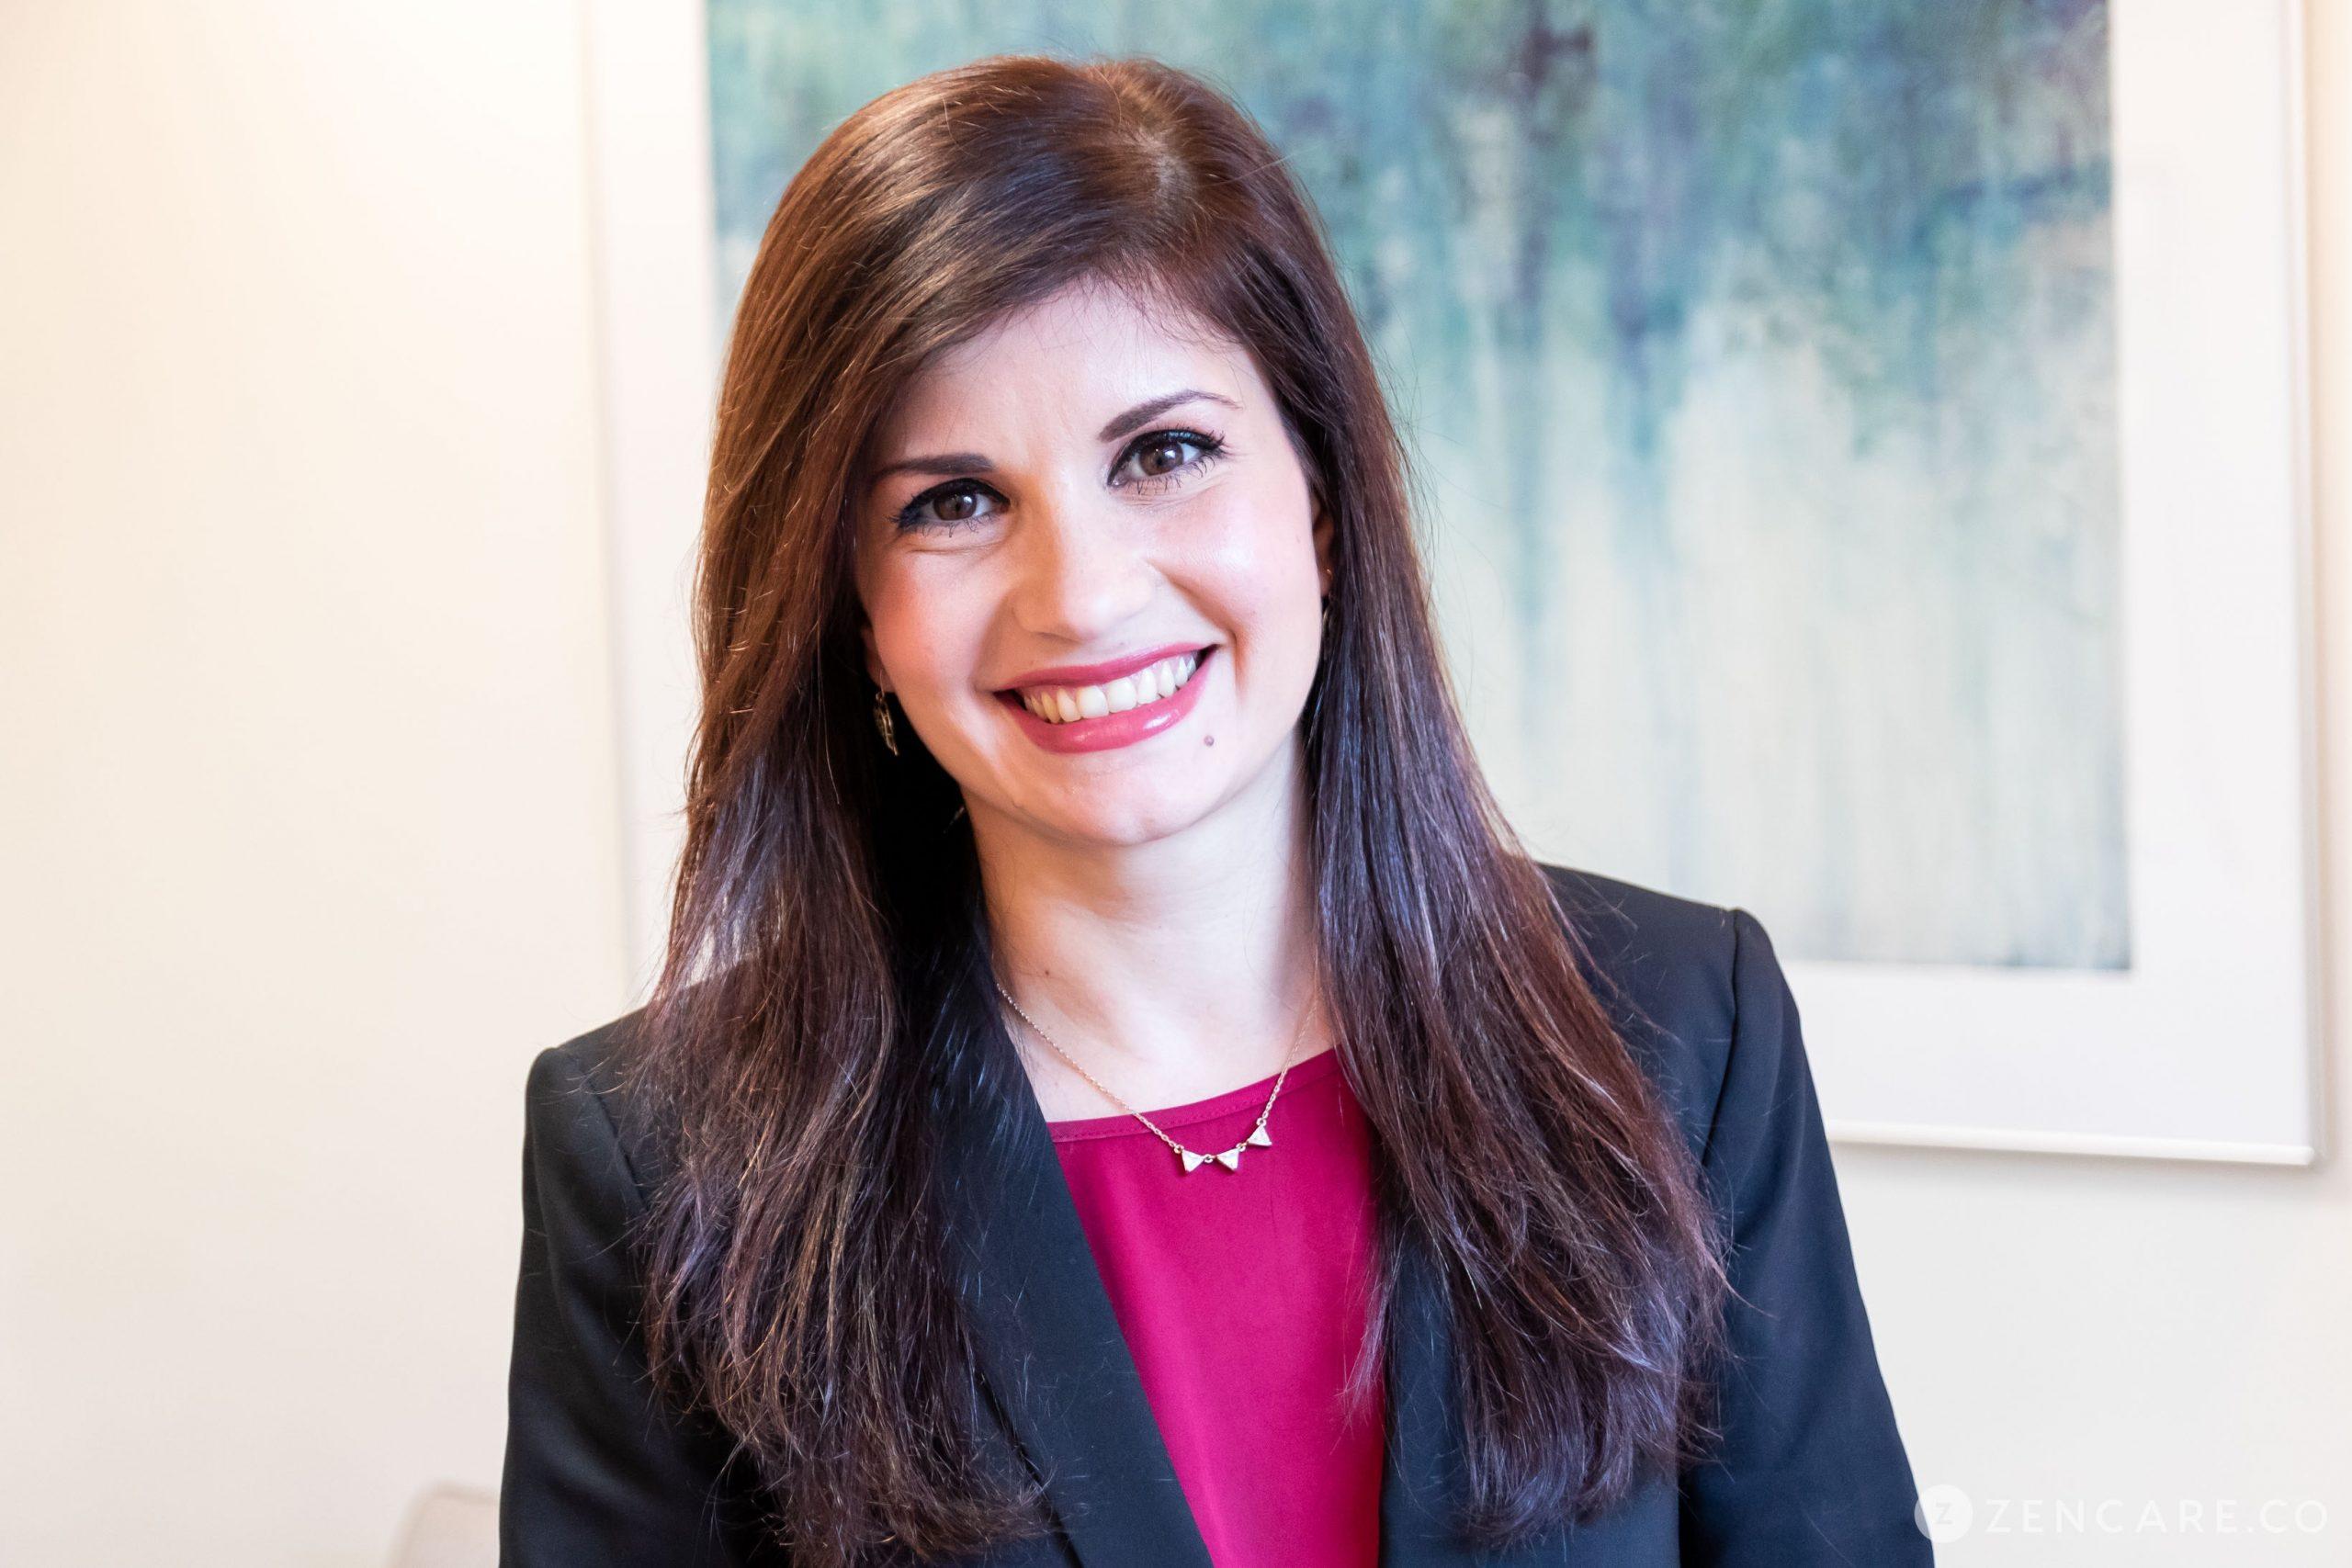 Dr. Mary Elizabeth Ruggiero